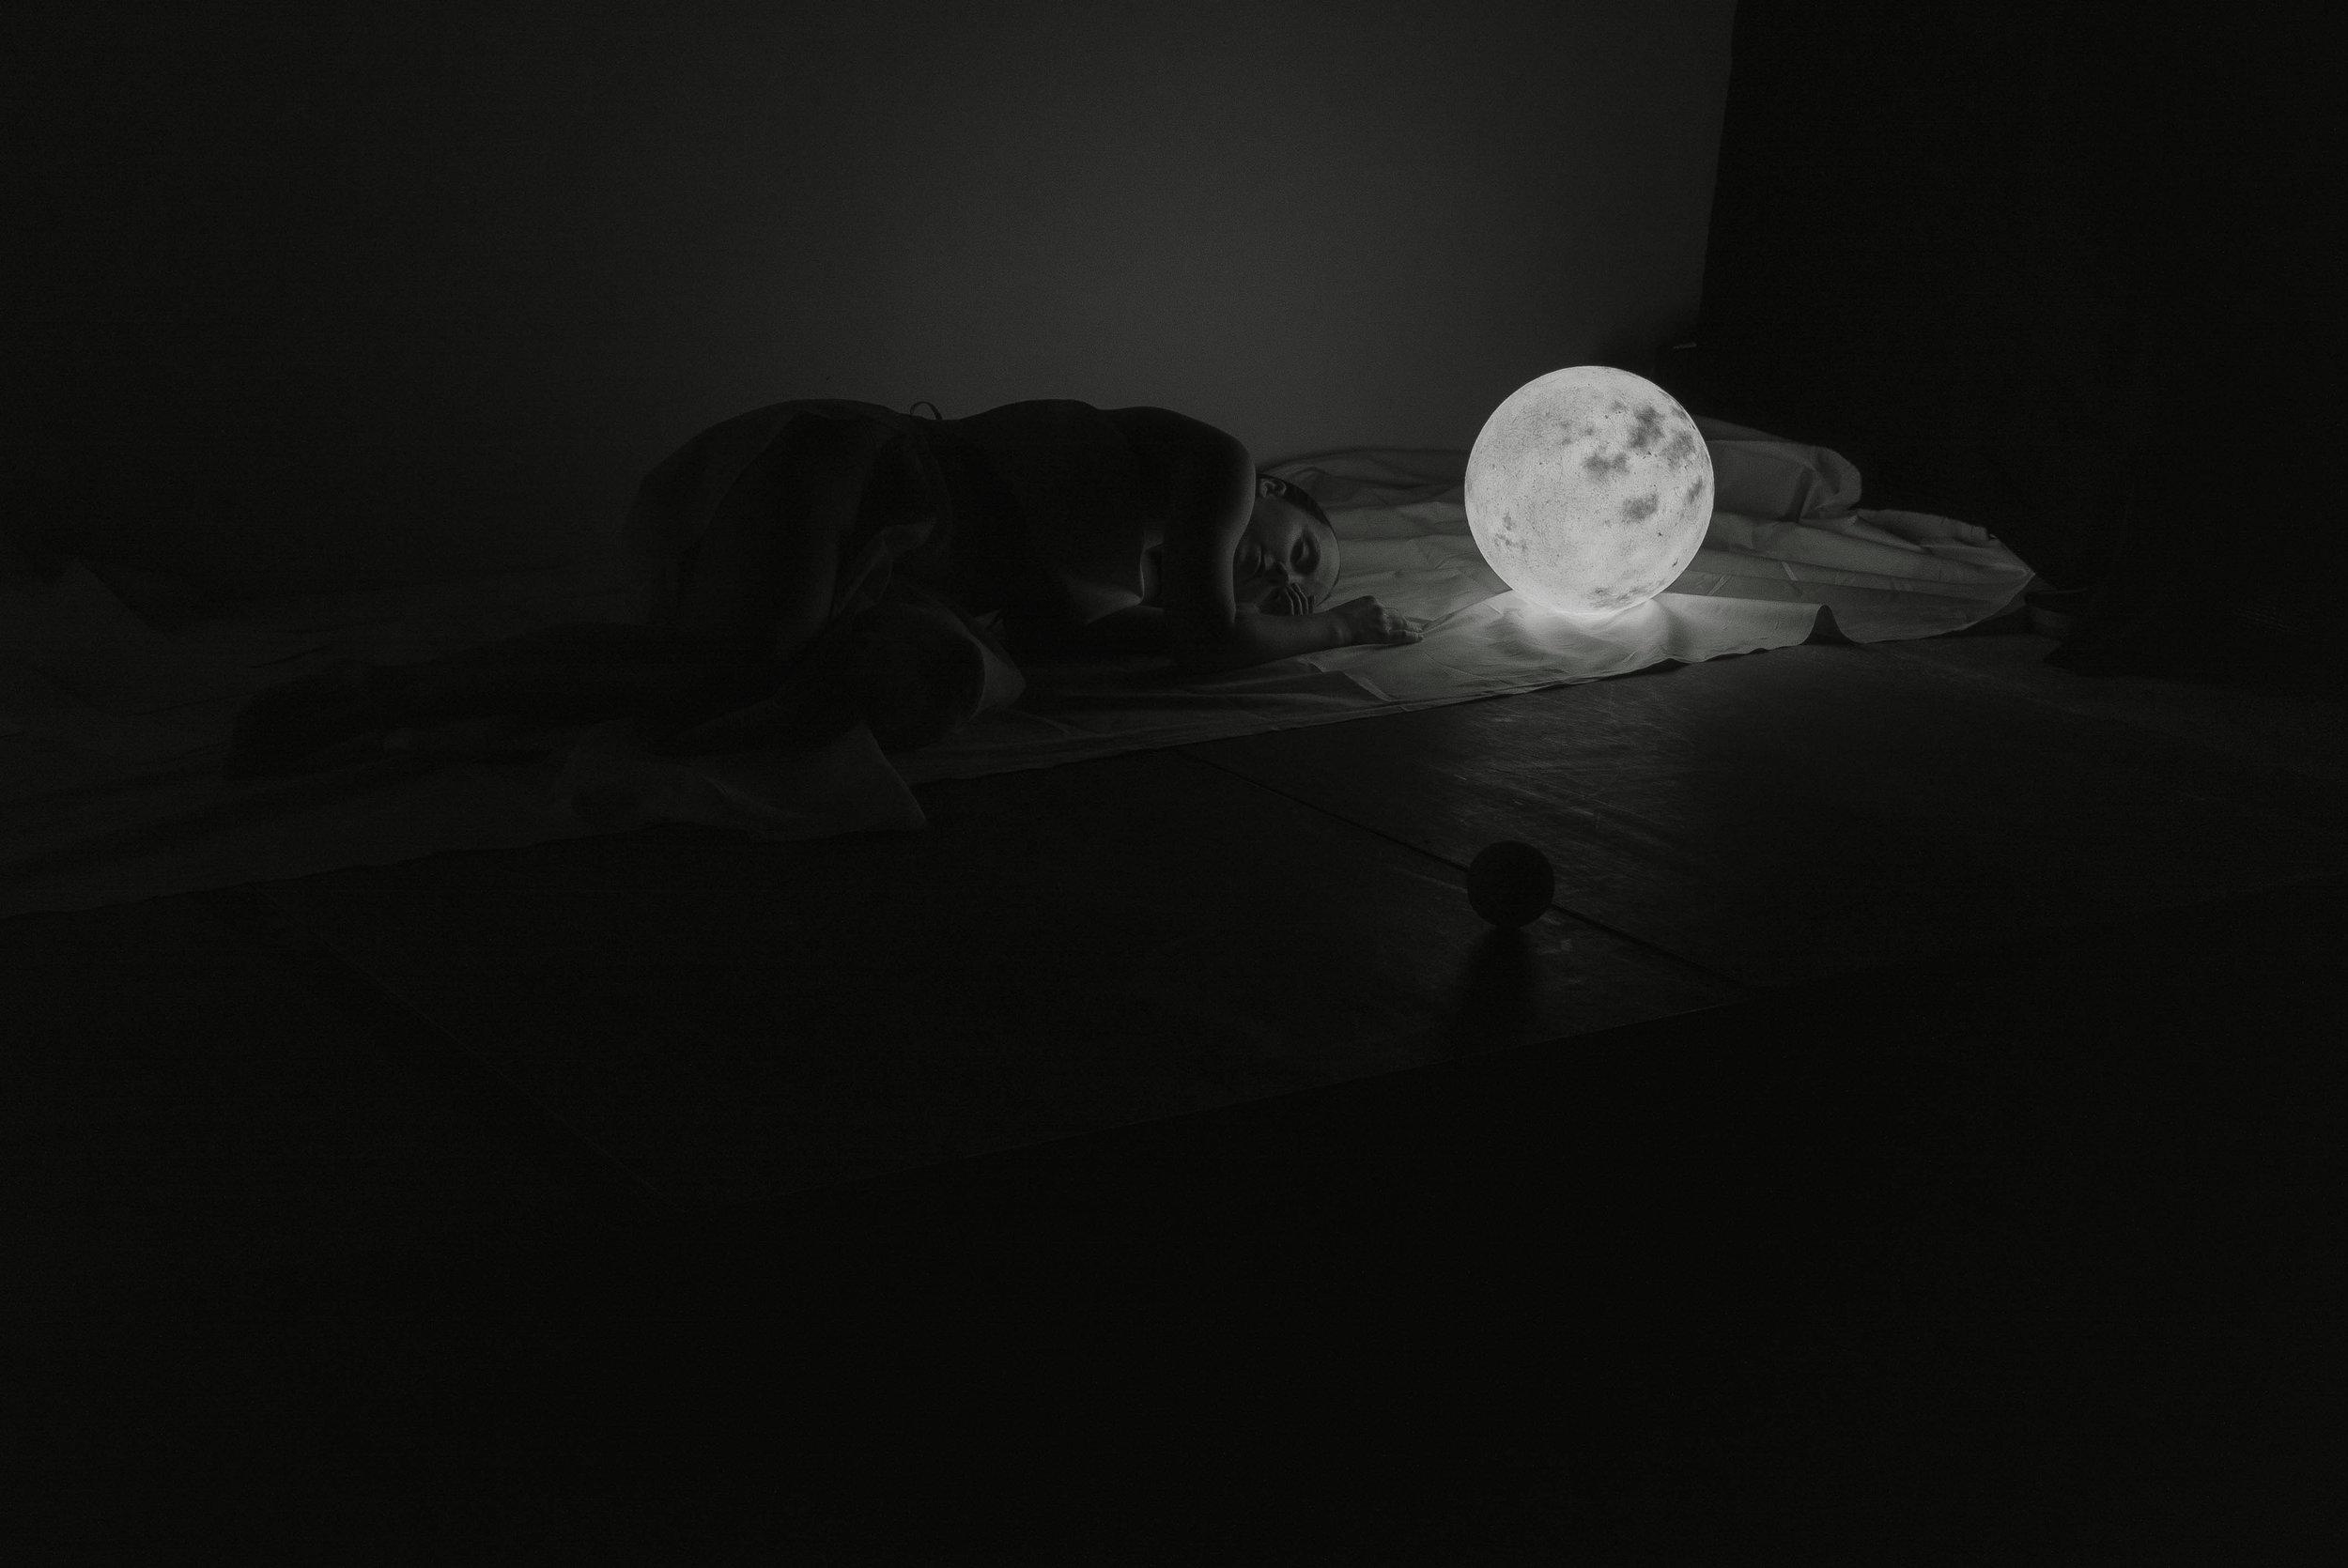 lieu-le-måne-oslo-ldthphotography-01.jpg